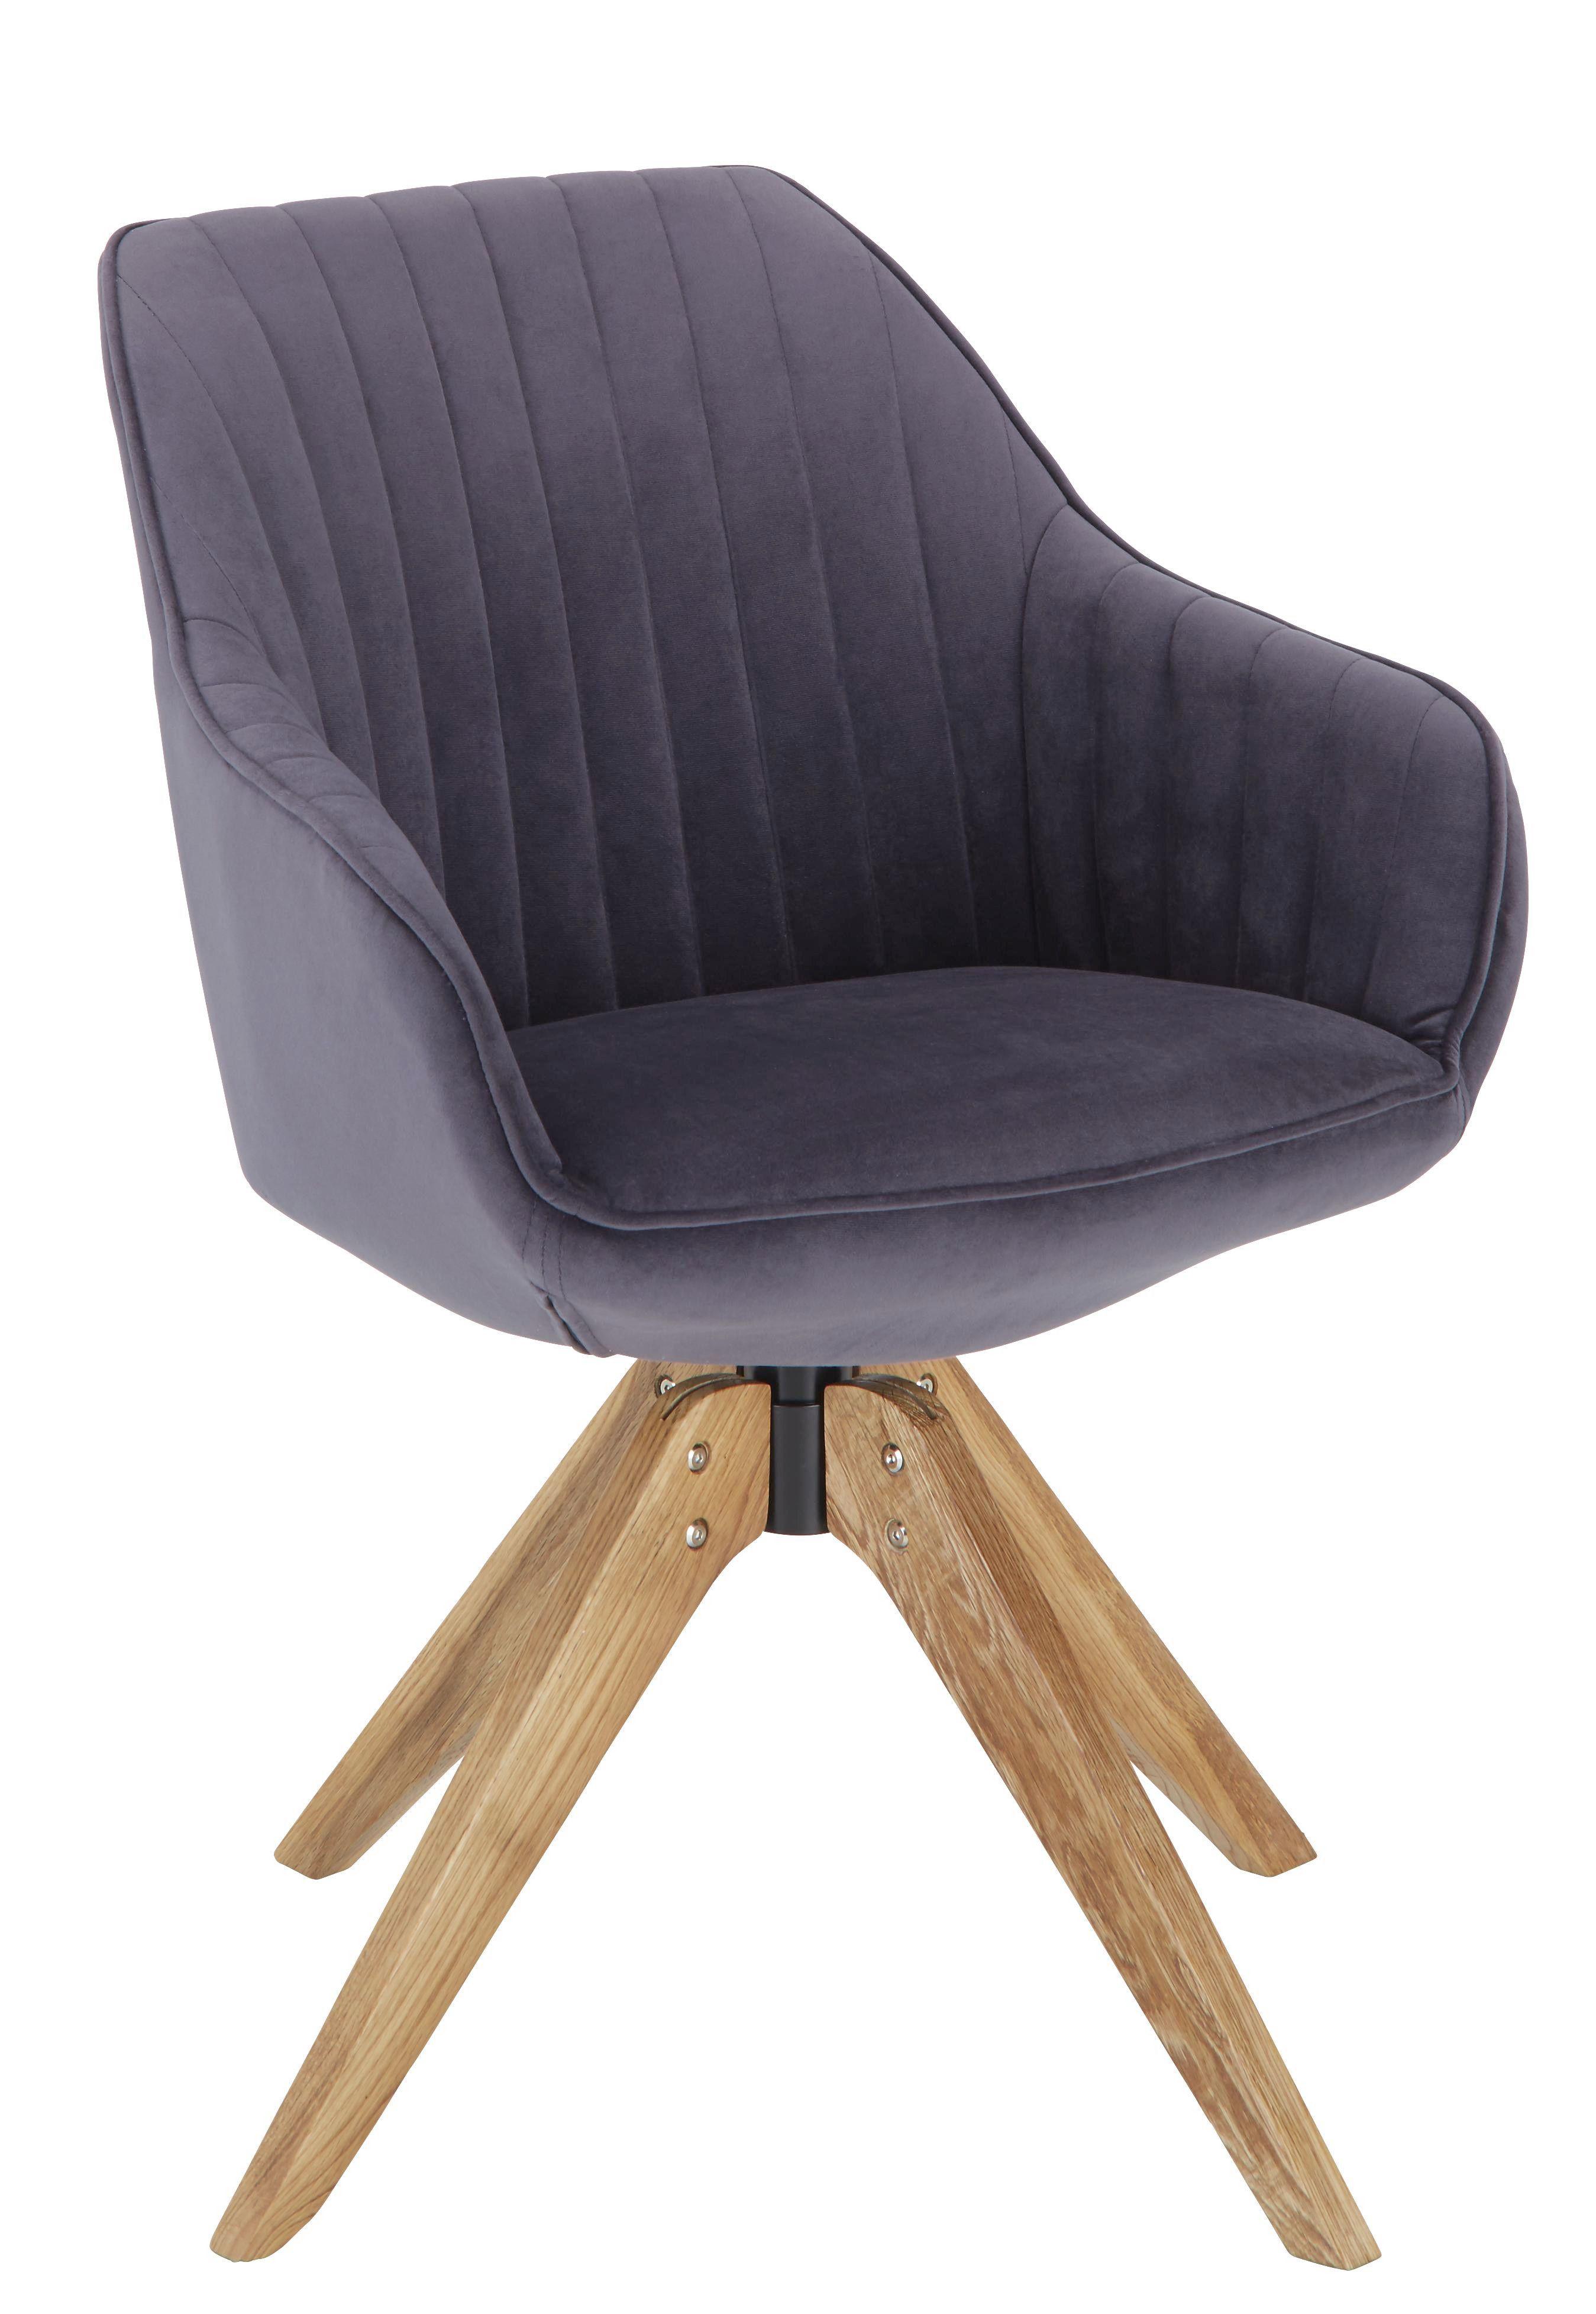 Židle S Područkami Chill - šedá/barvy dubu, dřevo/textilie (60/83/65cm) - Modern Living